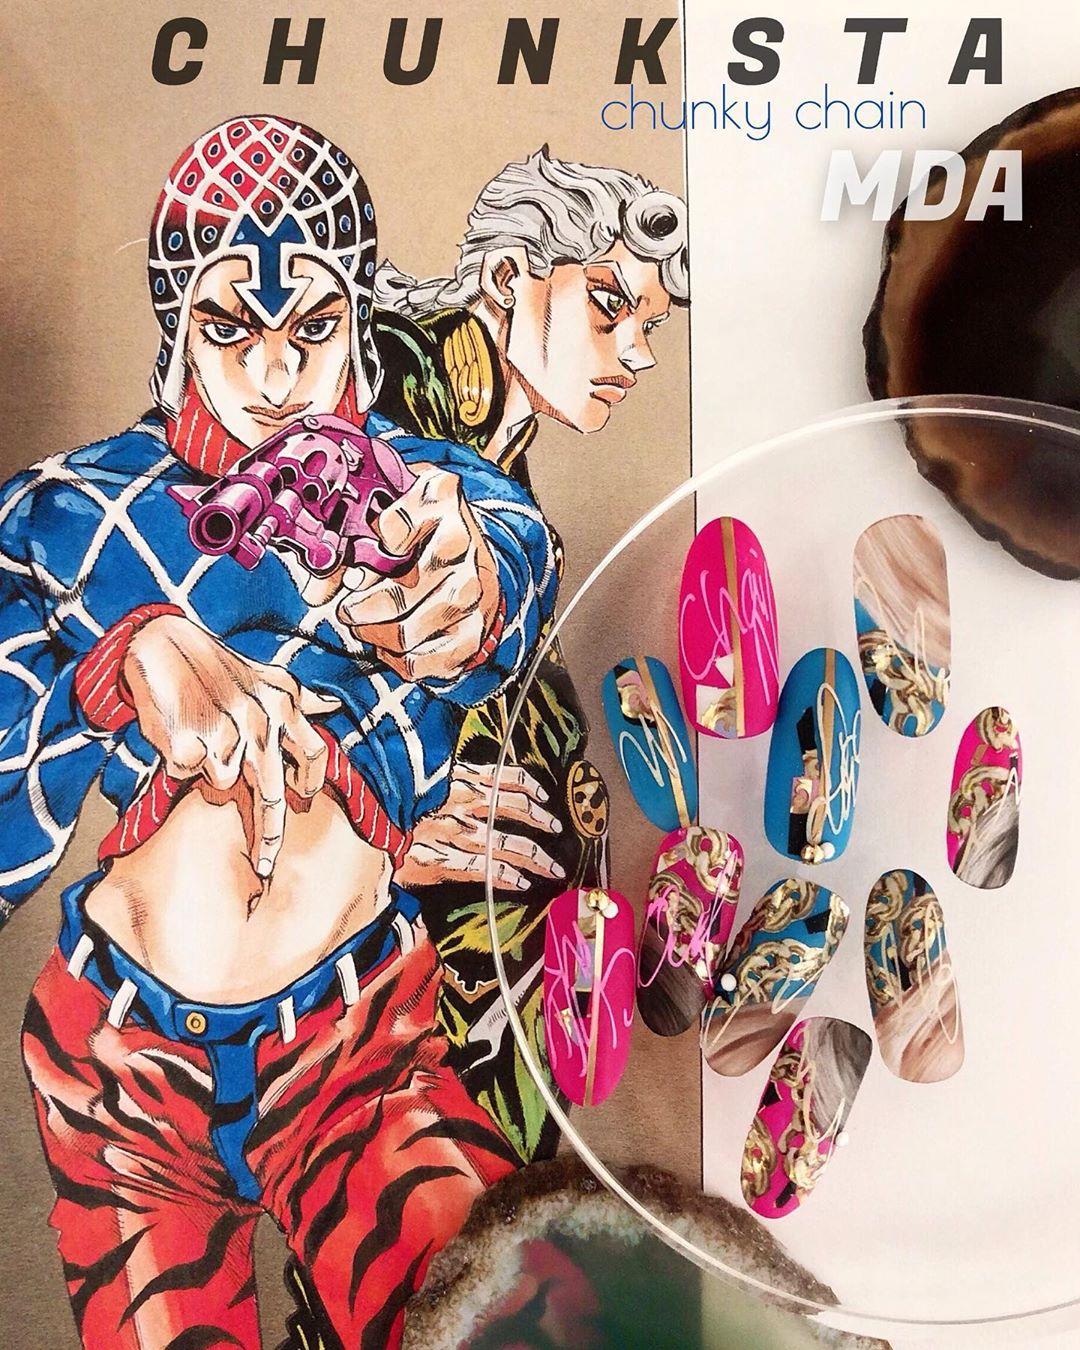 mdaCHUNKSTA  JOJO 5VERSACECHUNKSTA()mixCHUNKSTA ()!! !!ASIA NAIL fes.  81 These are homage to  JOJO. coming soon CHUNKSTA of chunky chain.it's the new material !check thi !!